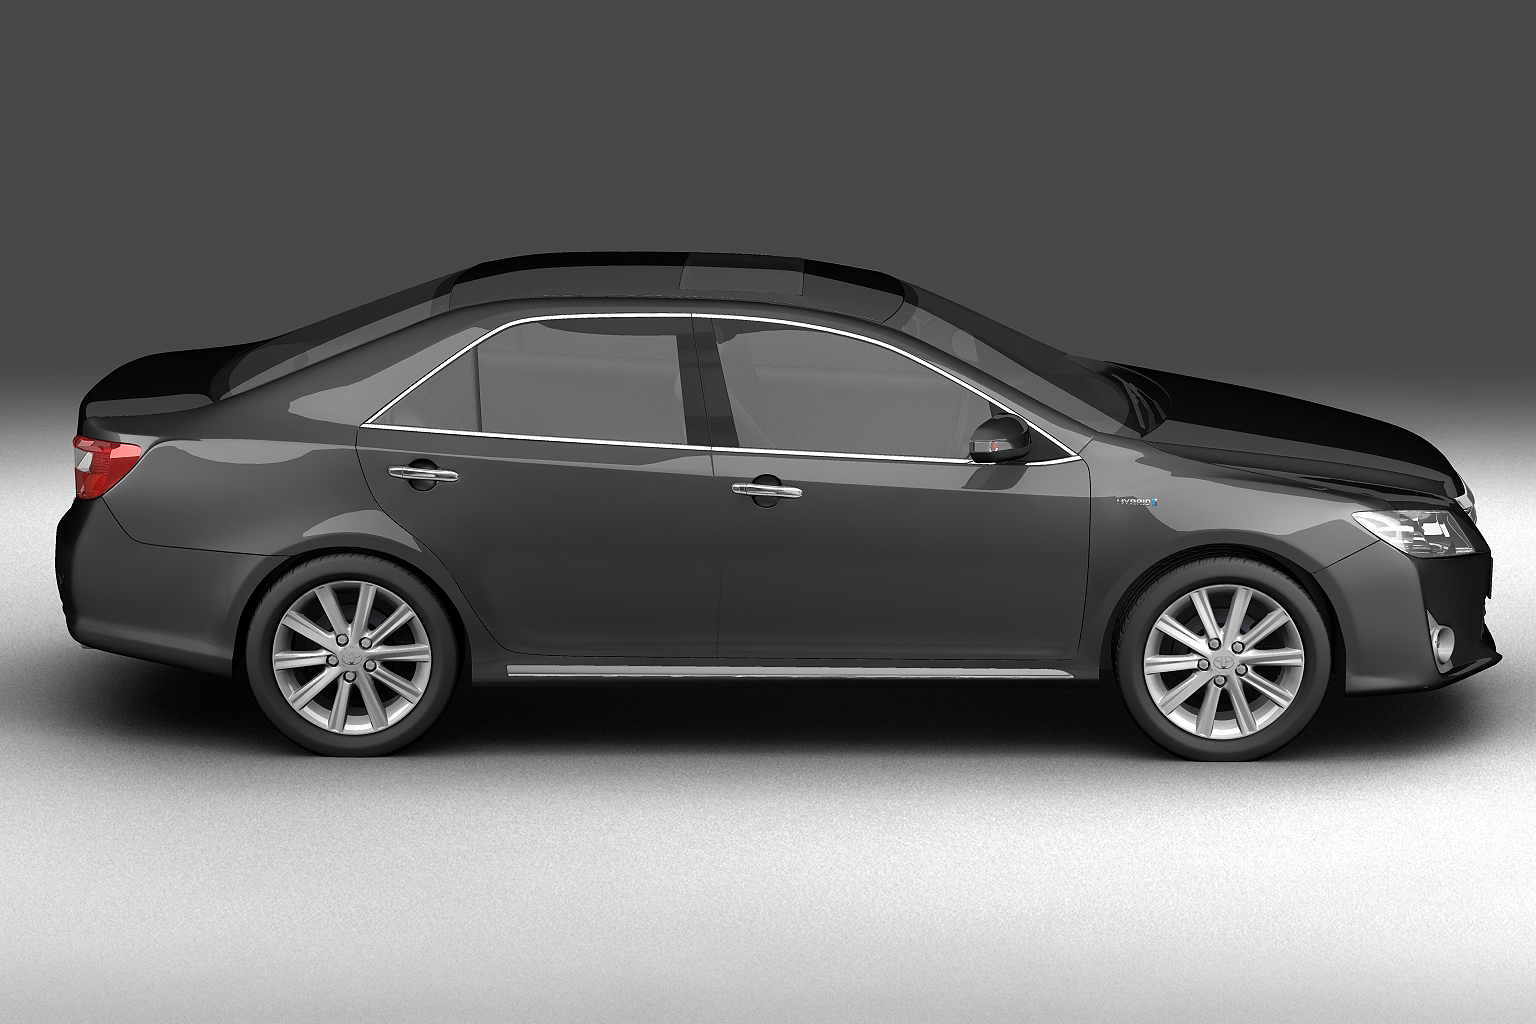 2012 toyota camry model 3d hybrid (asian) 3ds max fbx c4d lwo hrc xsi obj 136186